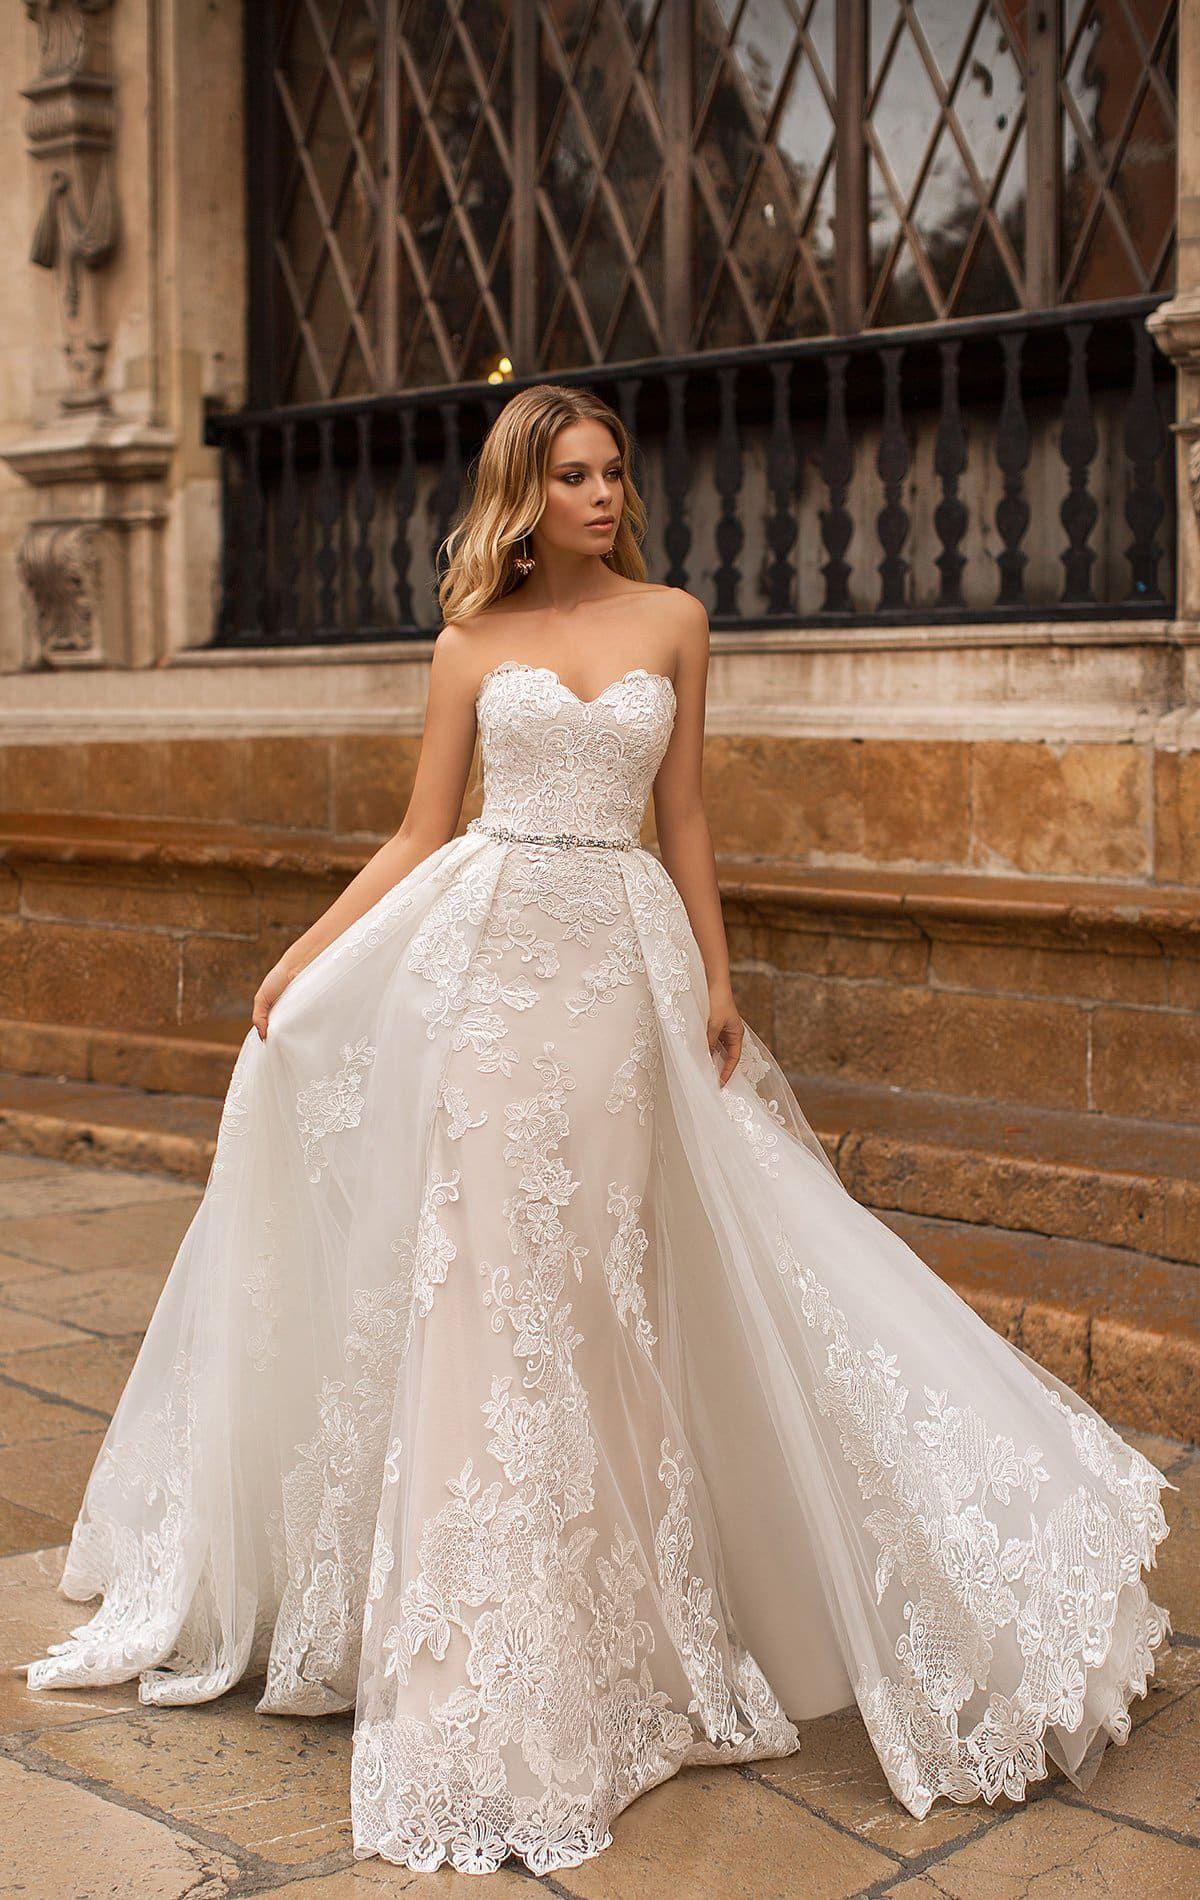 Brown wedding dresses  Naviblue Bridal  Wedding Dresses u Dolly Bridal Collection